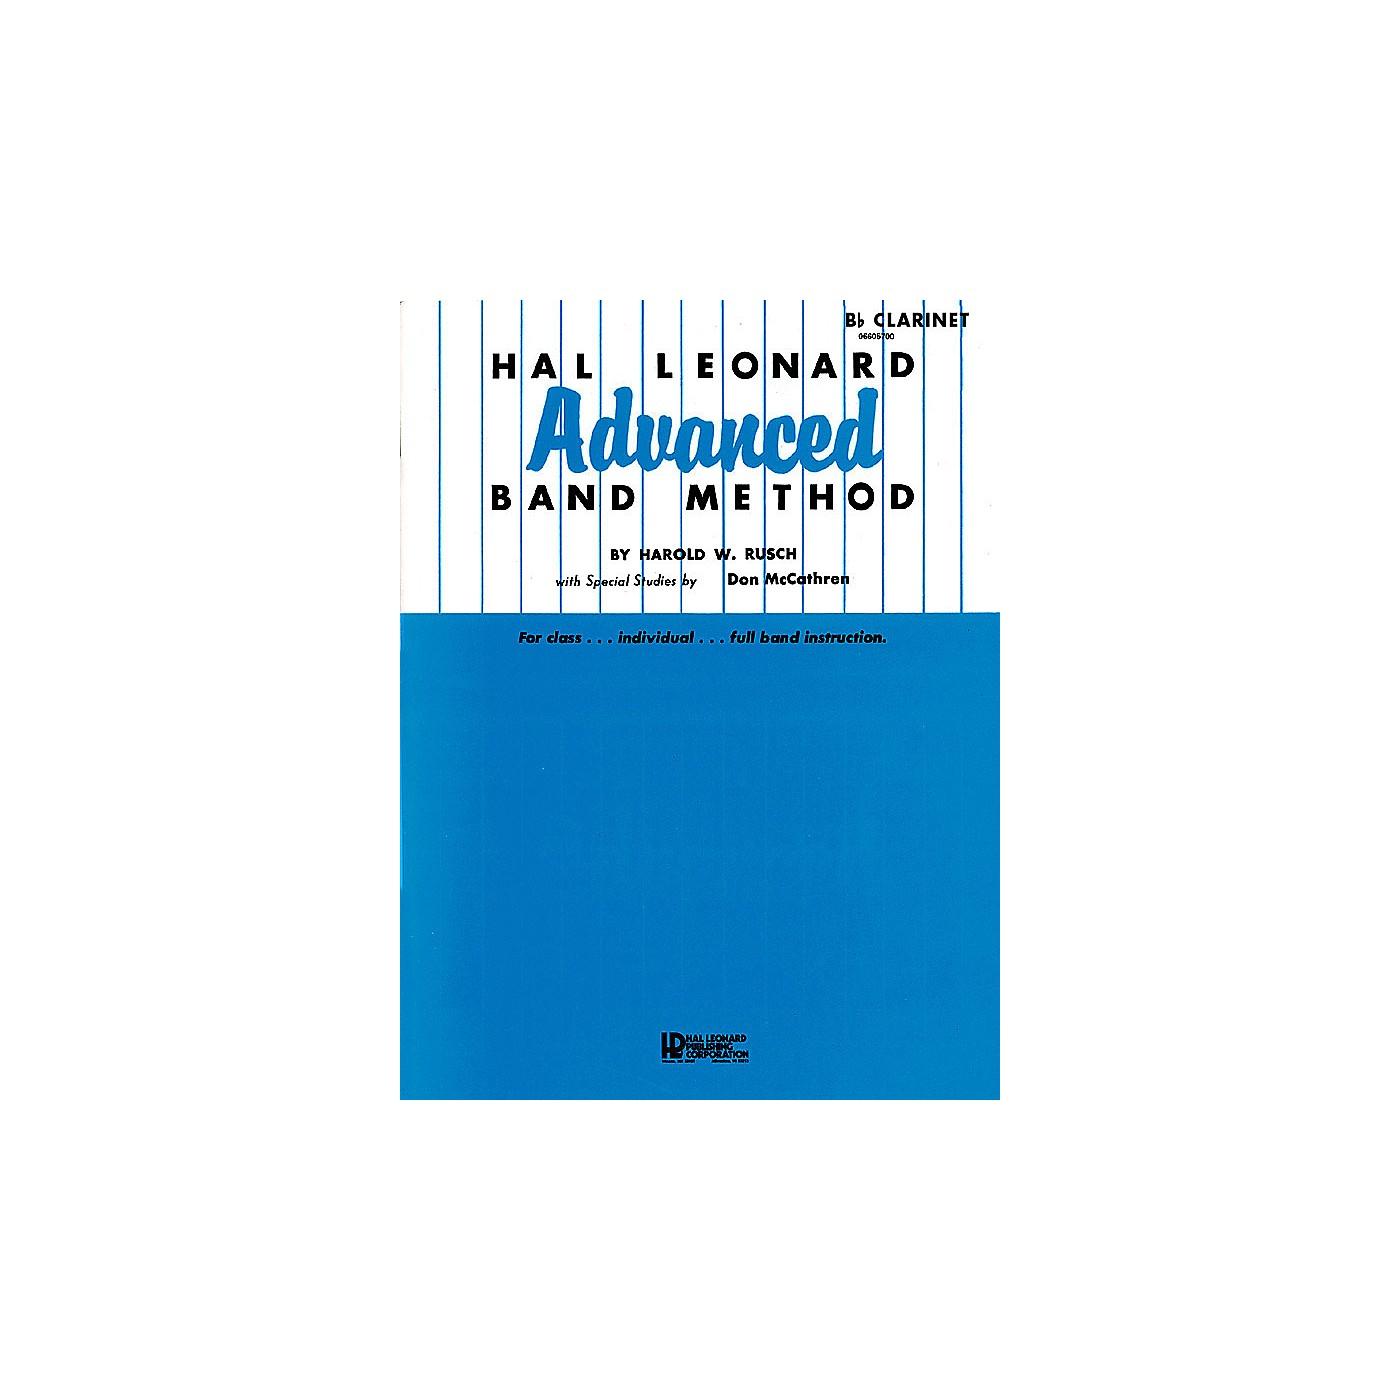 Hal Leonard Hal Leonard Advanced Band Method (Conductor) Advanced Band Method Series Composed by Harold W. Rusch thumbnail